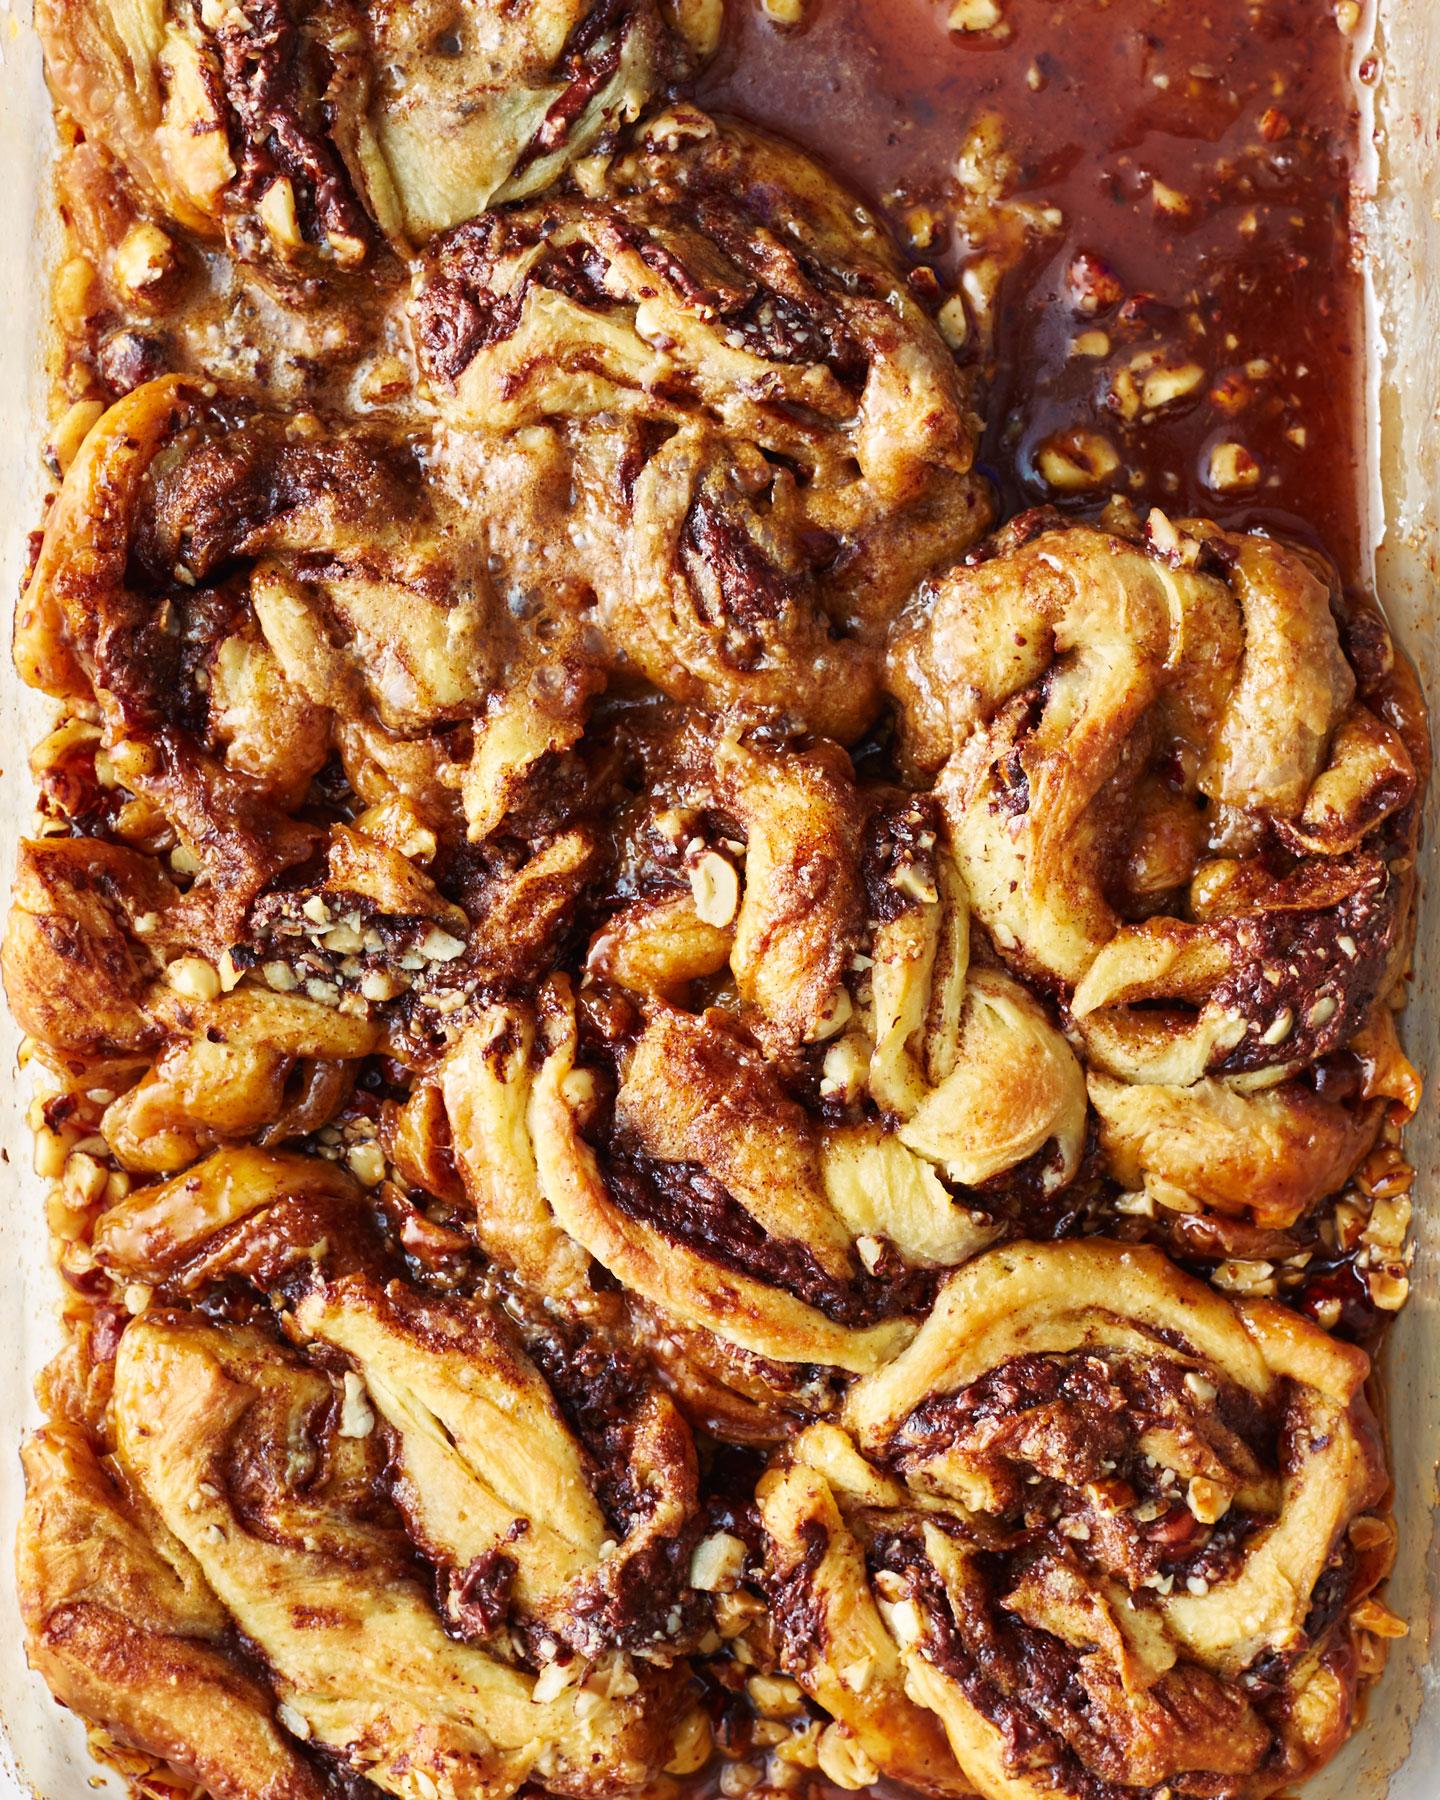 Sticky Cinnamon Roll Babka Buns image